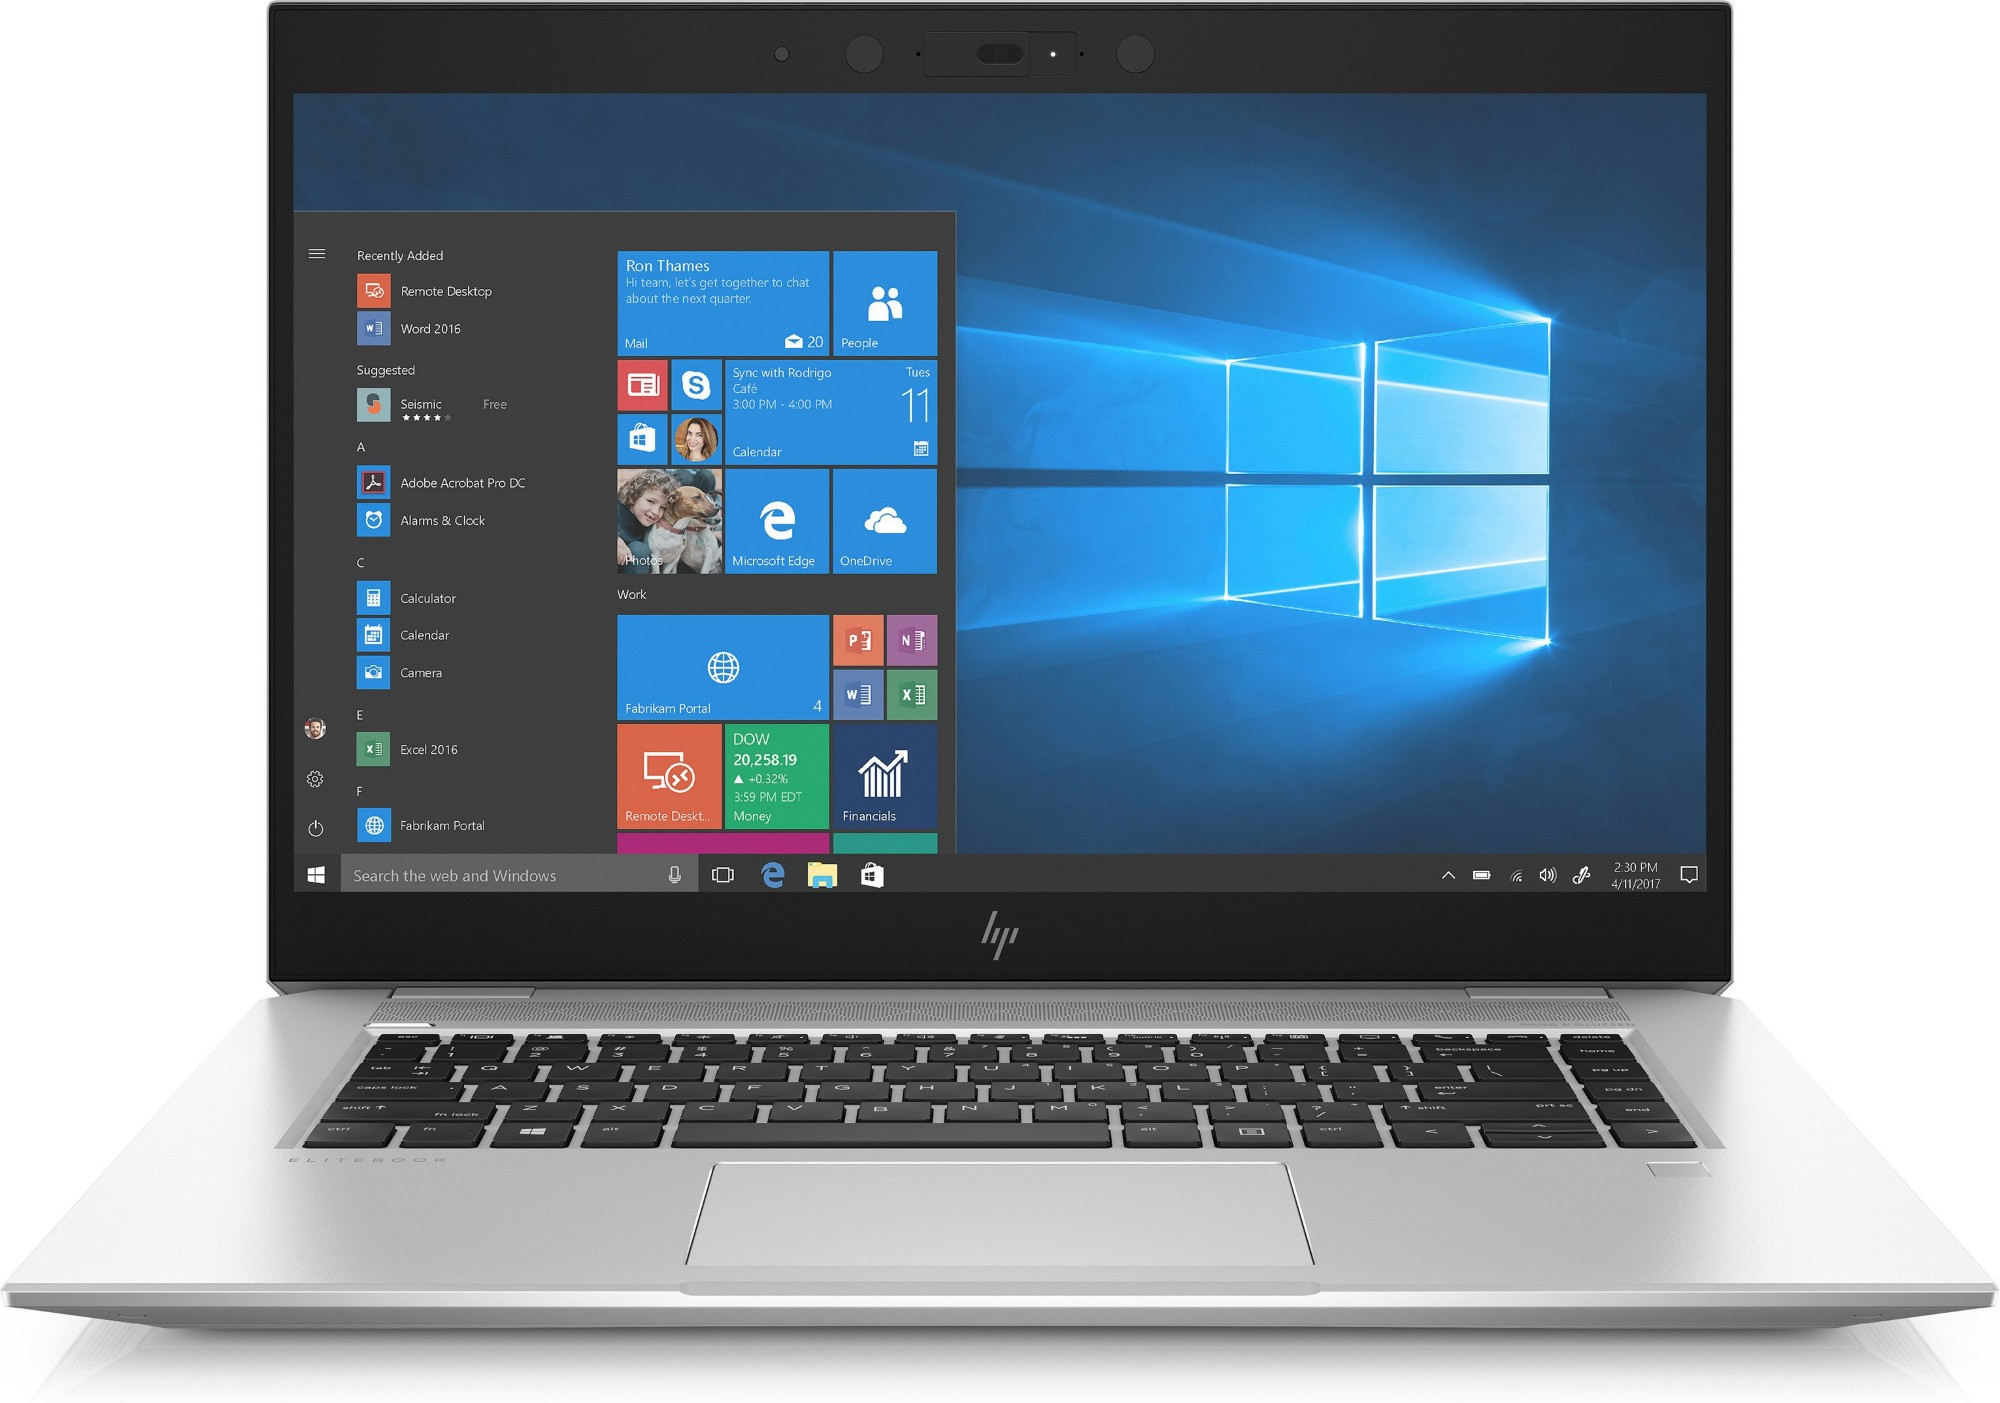 "HP EliteBook 1050 G1 Zilver Notebook 39,6 cm (15.6"") 1920 x 1080 Pixels Intel® 8ste generatie Core™ i5 i5-8300H 8 GB DDR4-SDRAM 256 GB SSD"